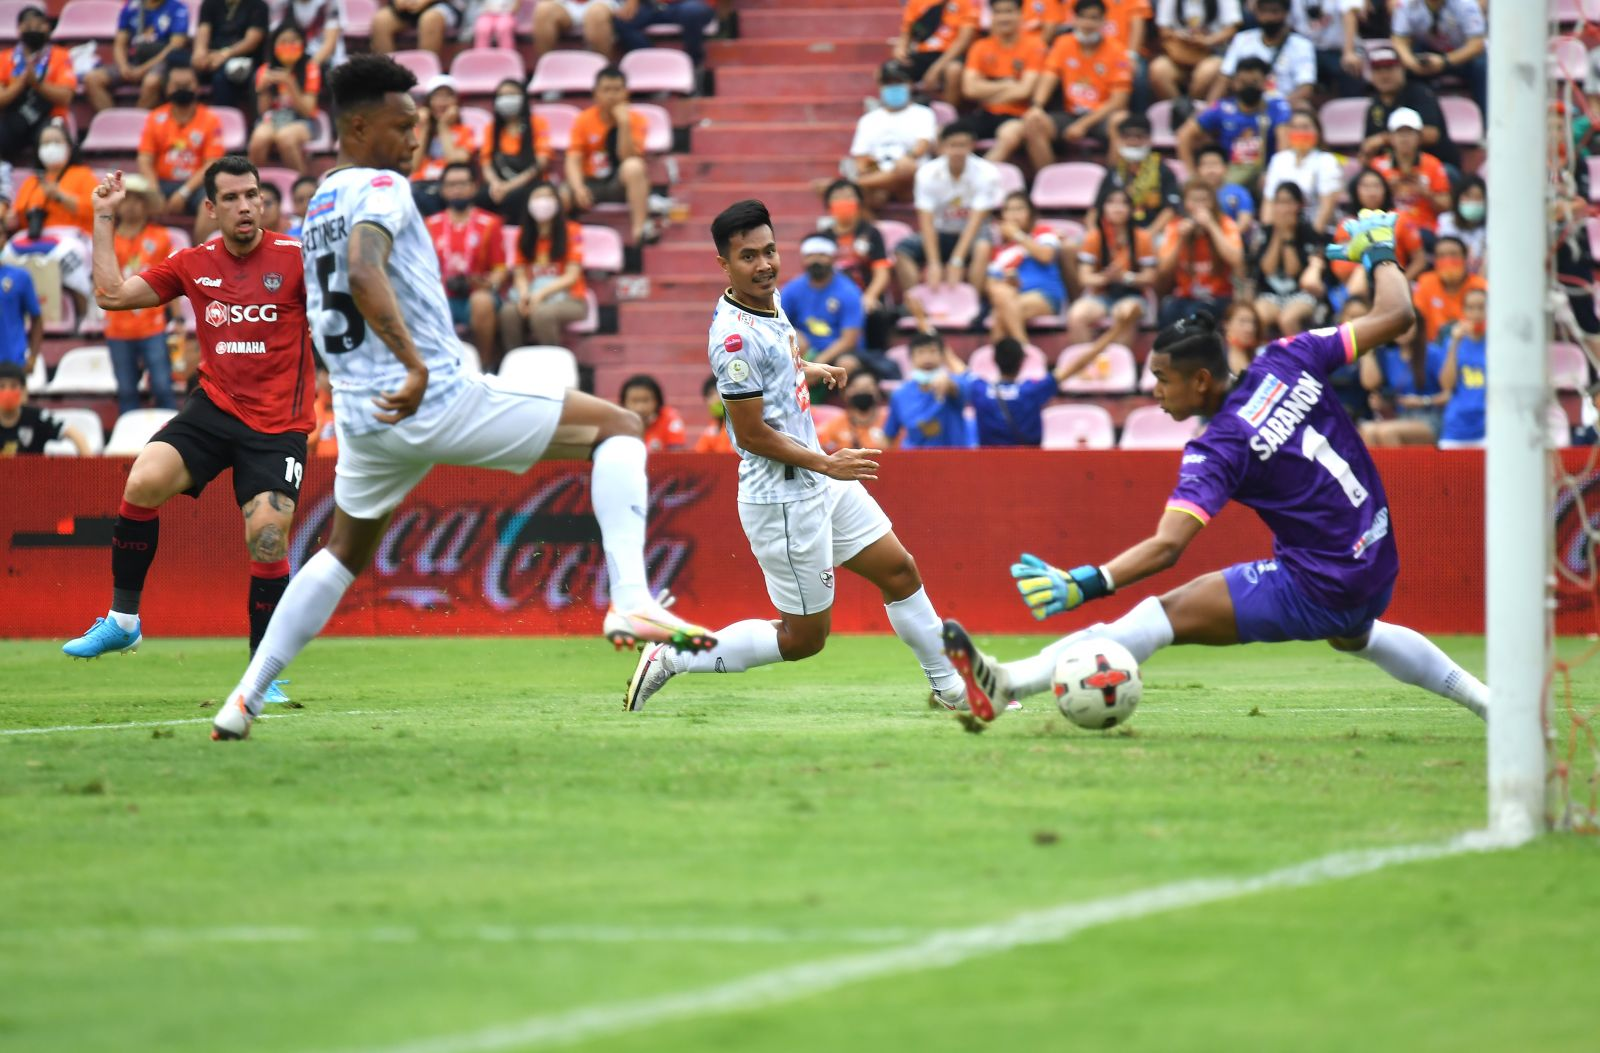 Chiangrai United Ends SCG Muang Thong's Bid for a Top 3 Finish